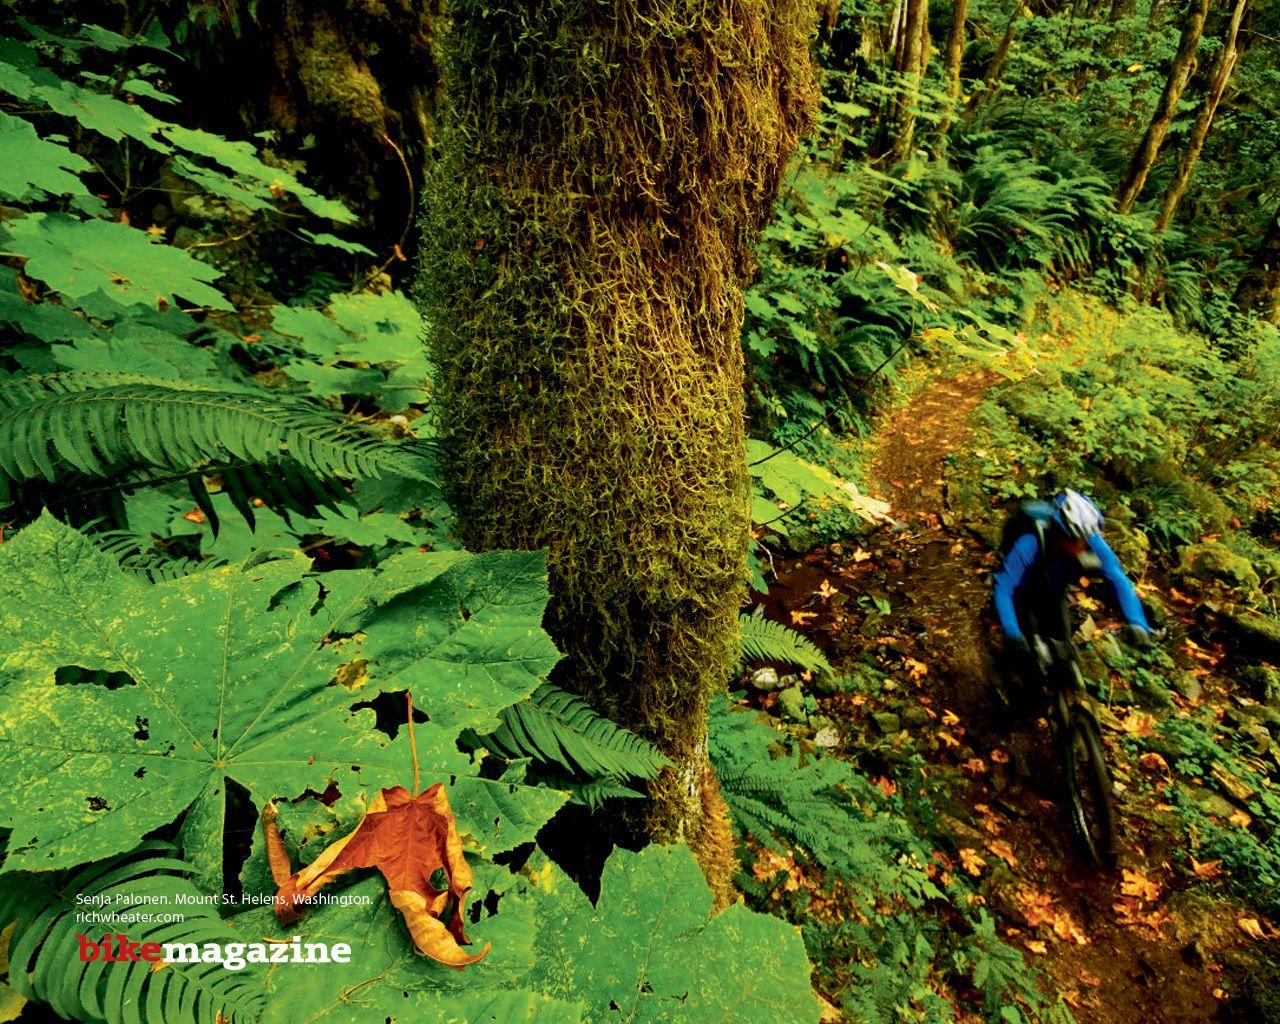 mountain bike in florest 2206 1280x1024jpg 1280x1024